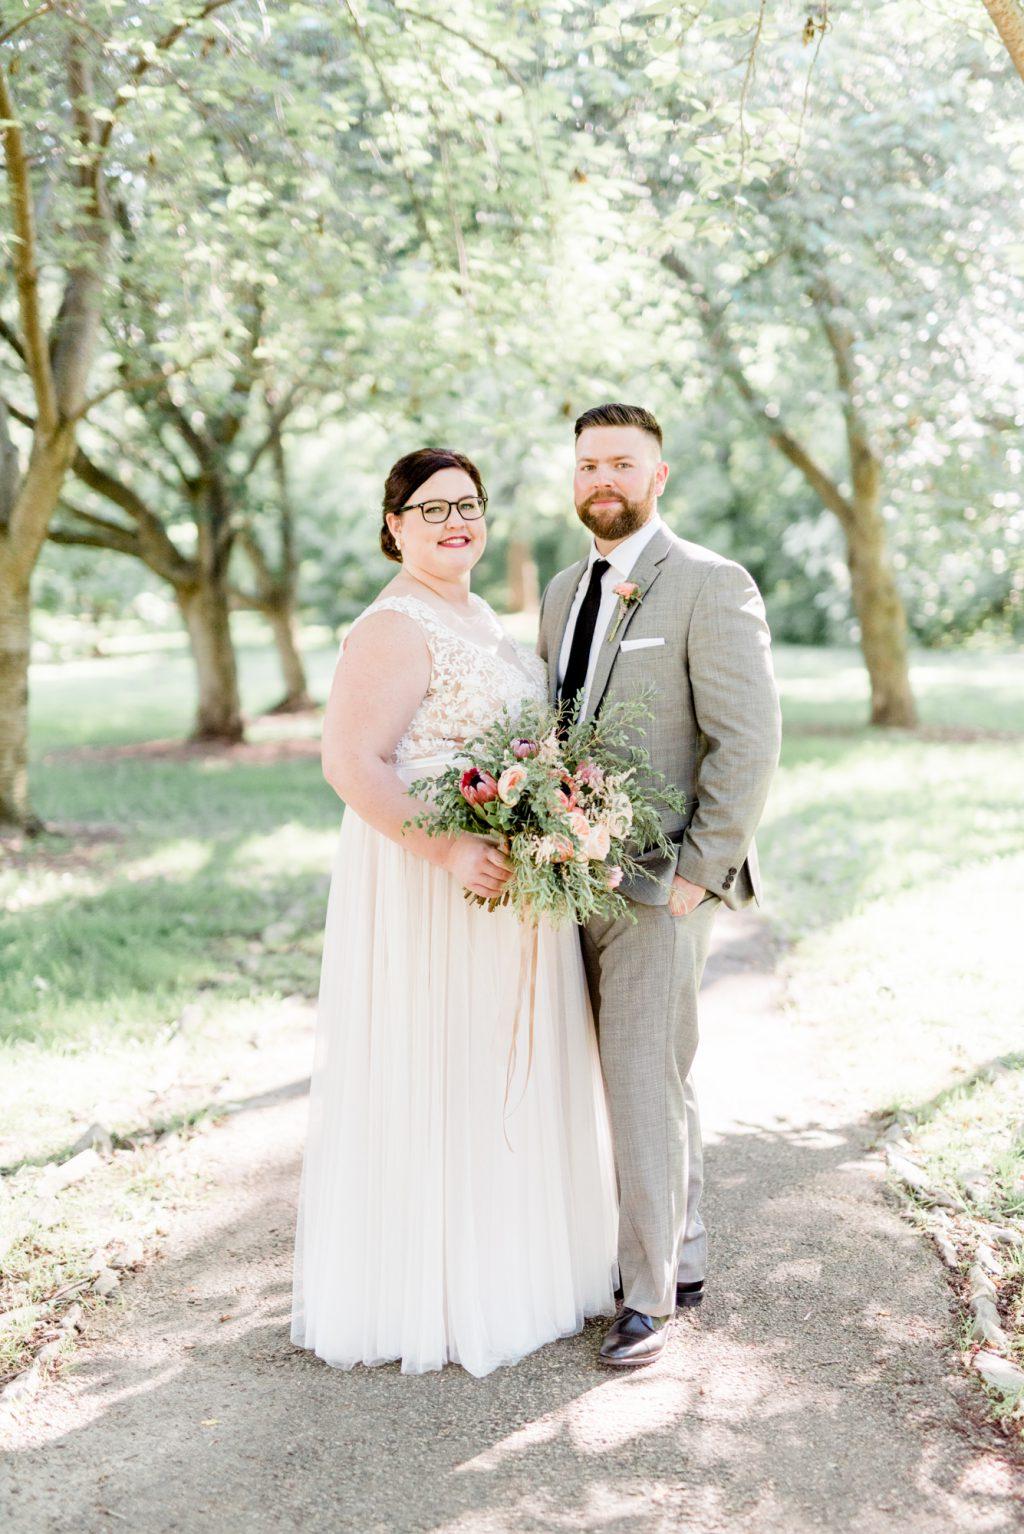 haley-richter-photo-west-chester-summer-wedding-boxcar-brewery-150